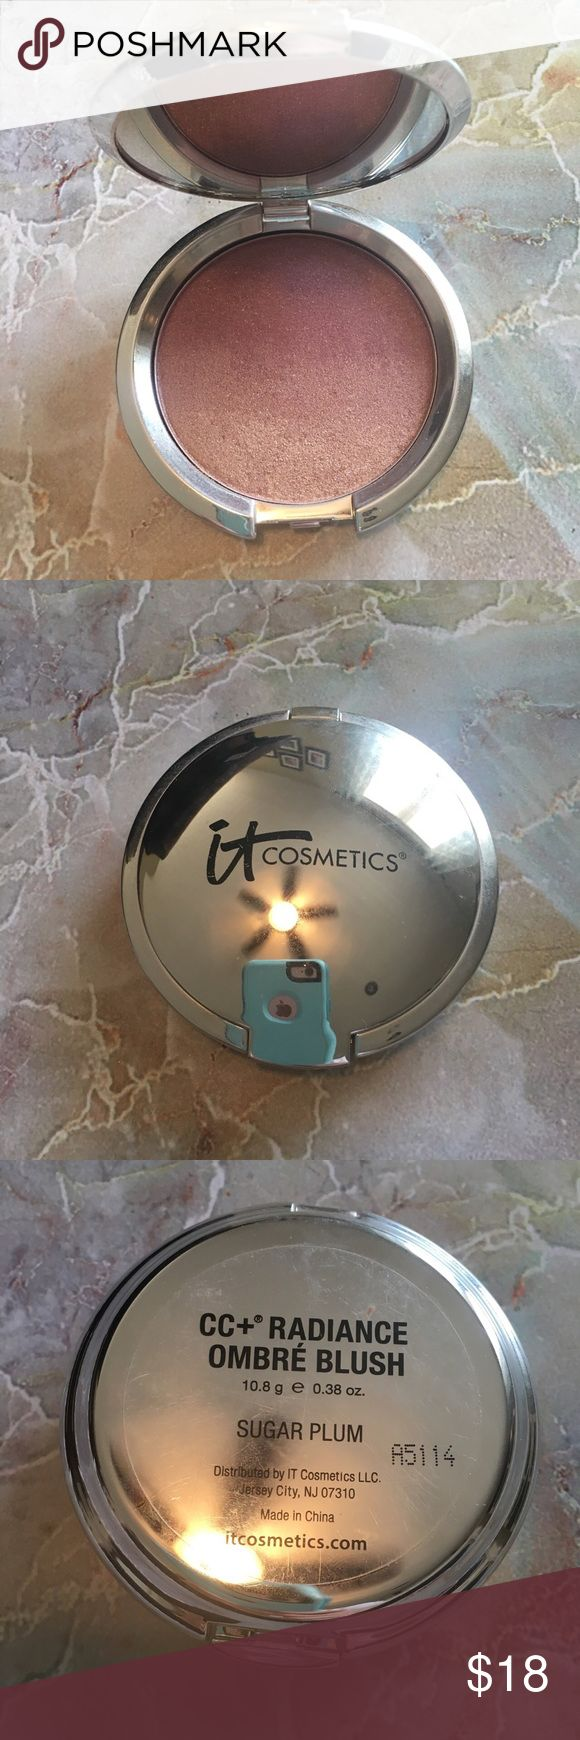 It Cosmetics Sugar Plum blush. CC+ Ombre Radiance Blush.  Lightly used.  Purchased from Ulta. It Cosmetics Makeup Blush